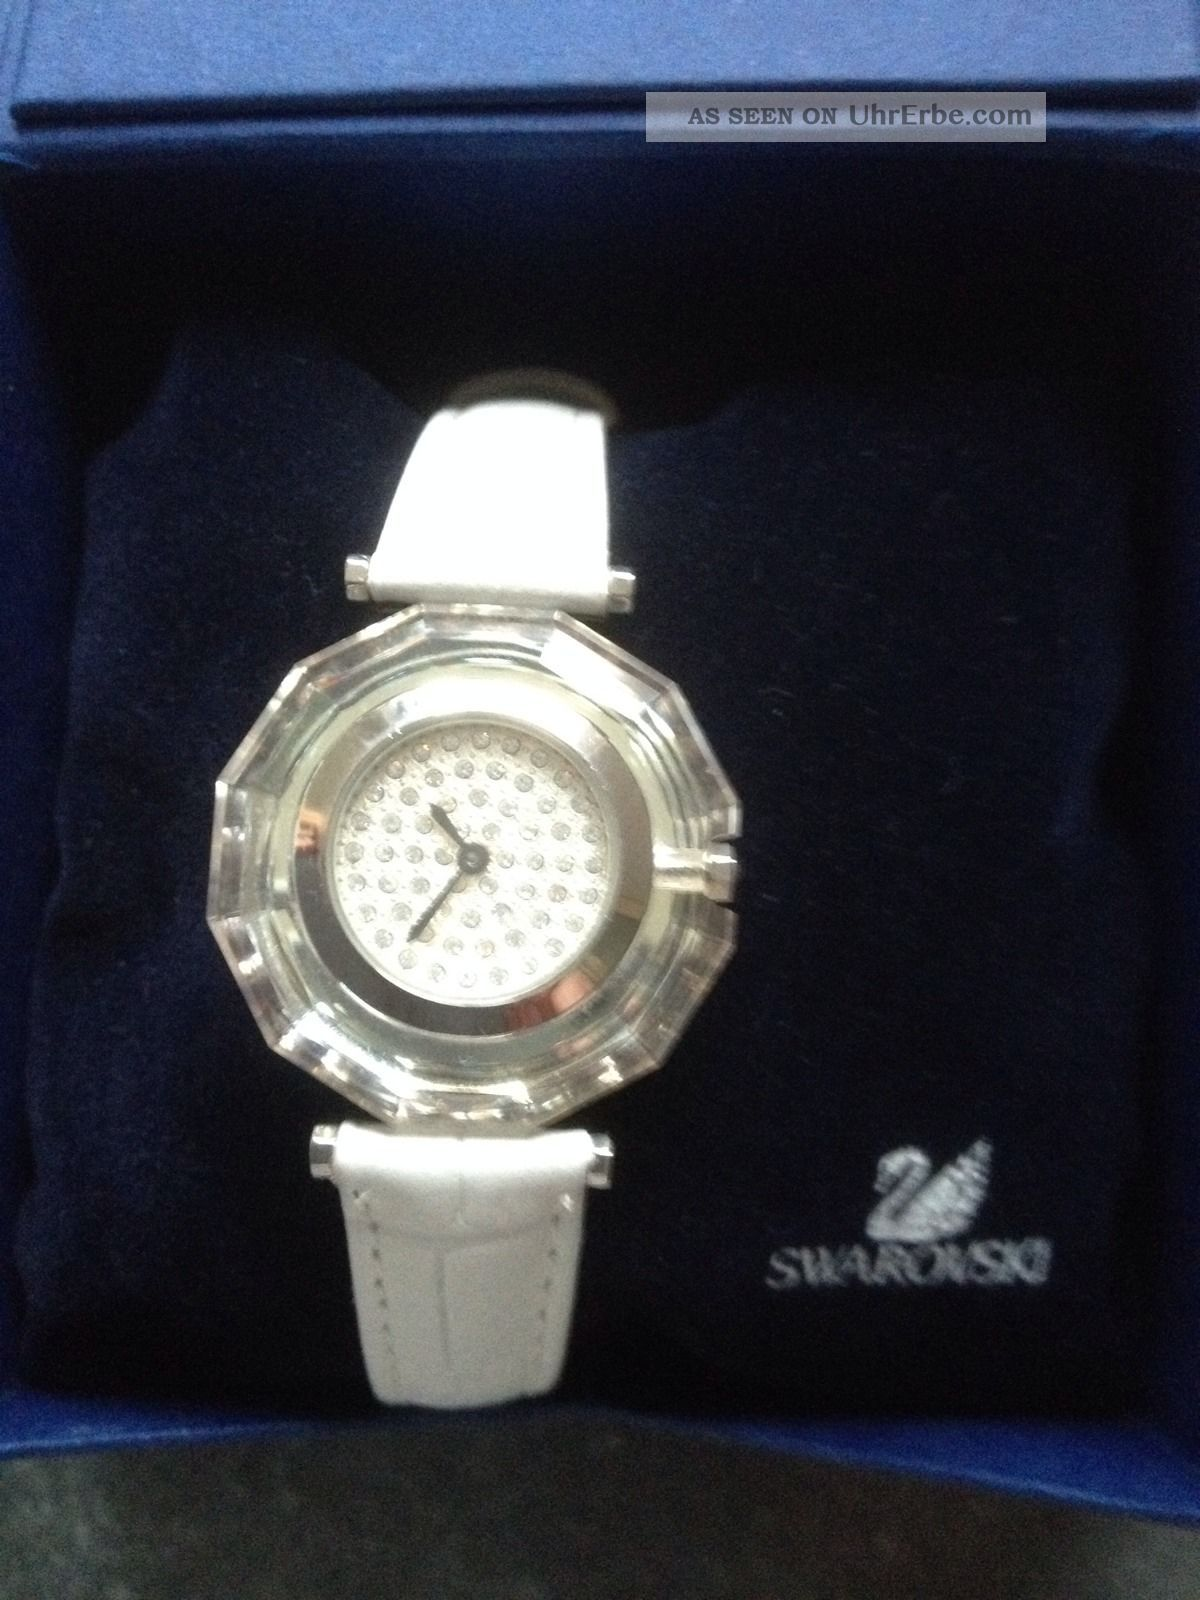 Swarowski Uhr